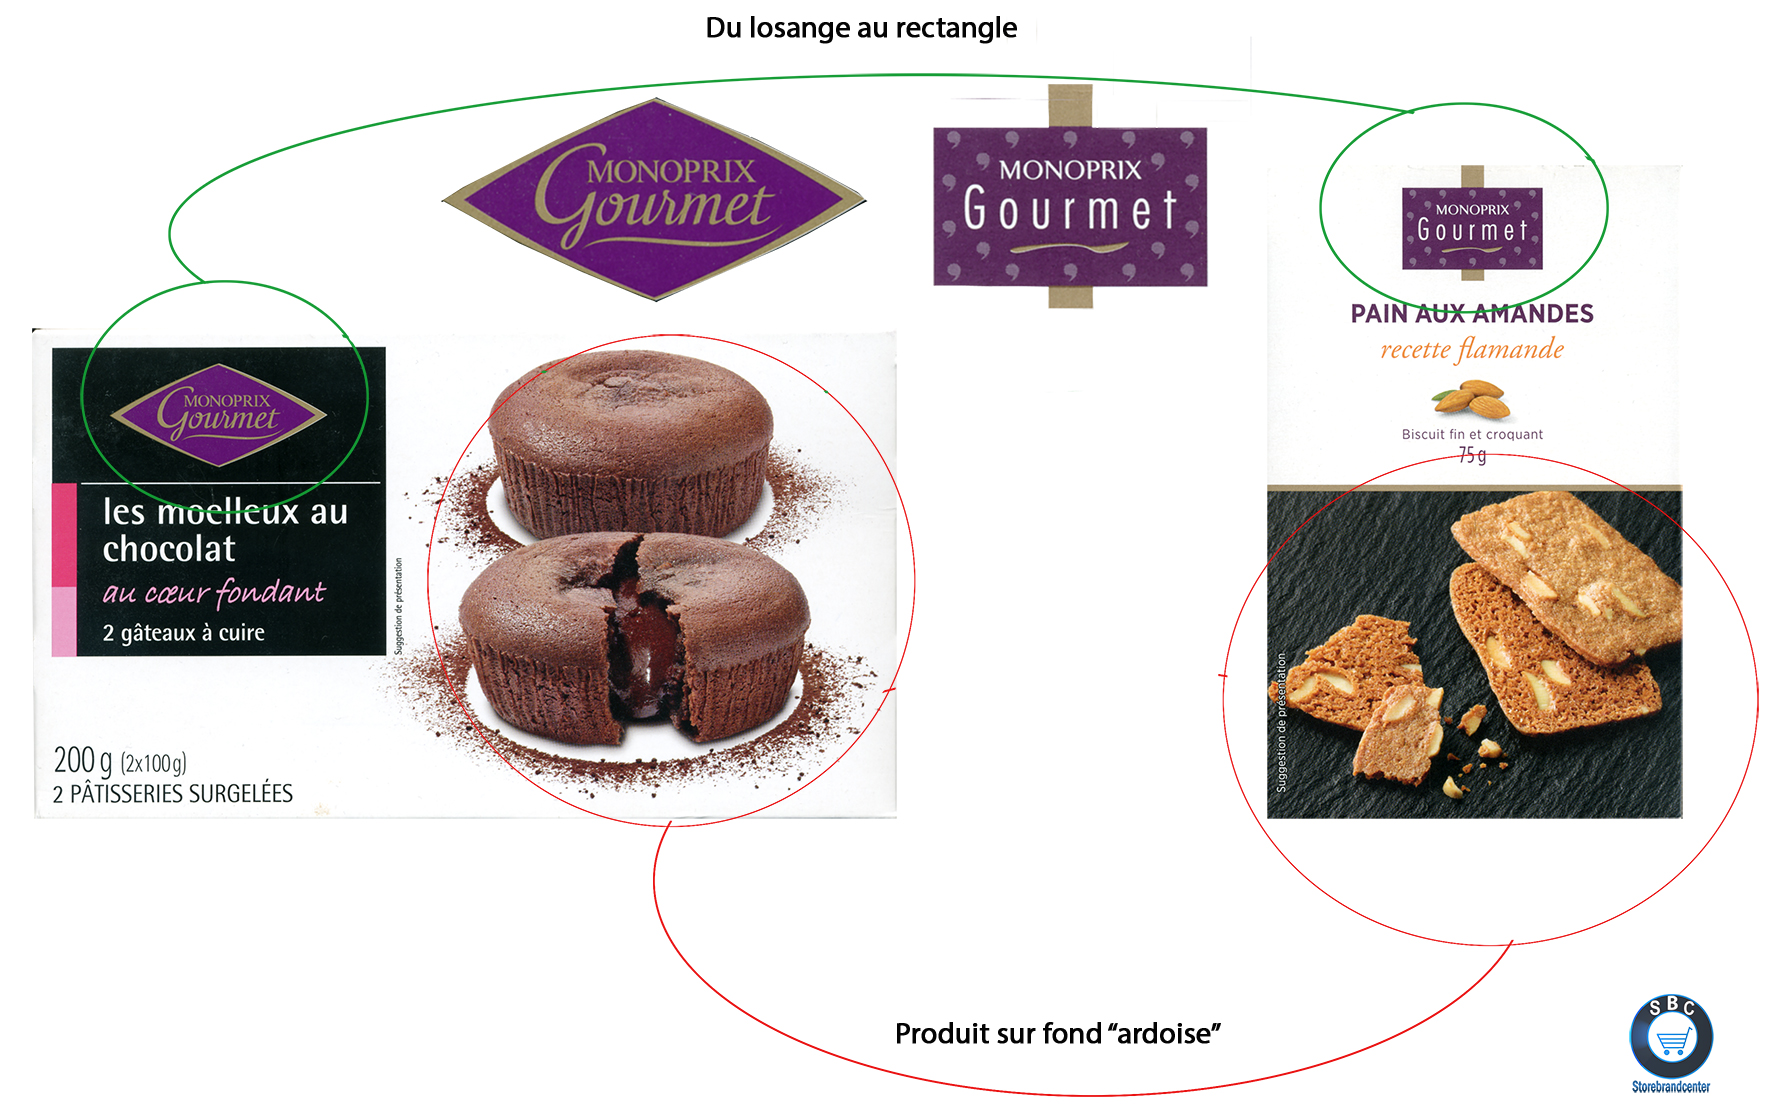 Monoprix gourmet logo